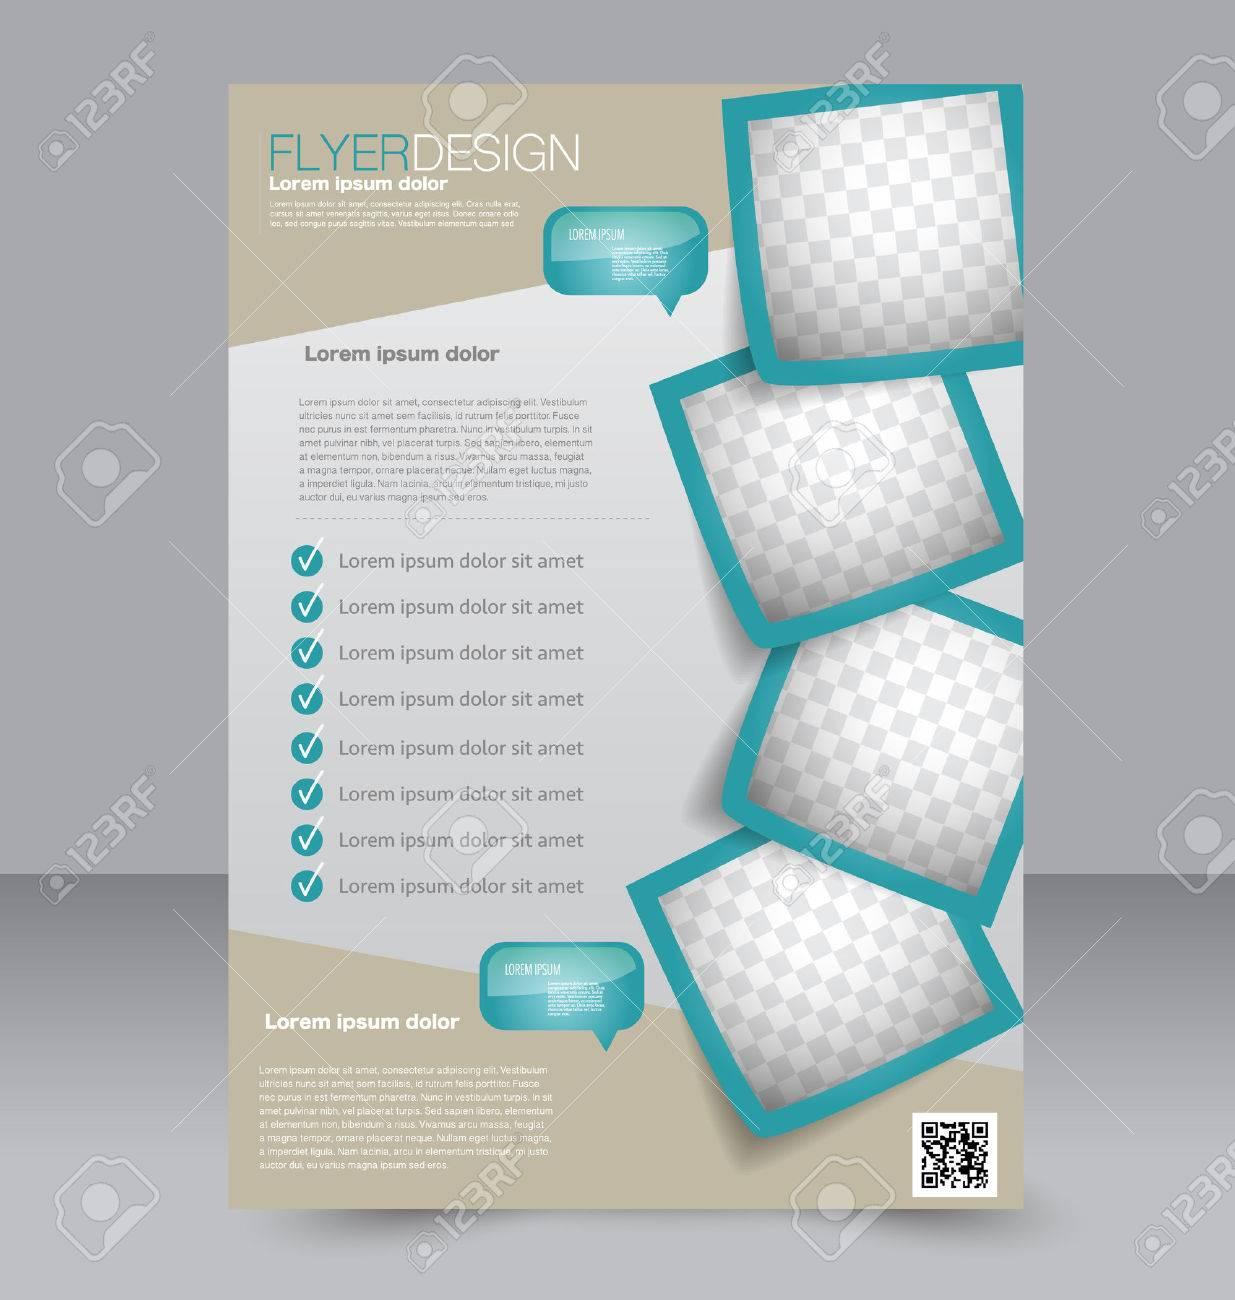 Brochure design. Flyer template. Editable A4 poster for business, education, presentation, website, magazine cover. Green color. - 52297074